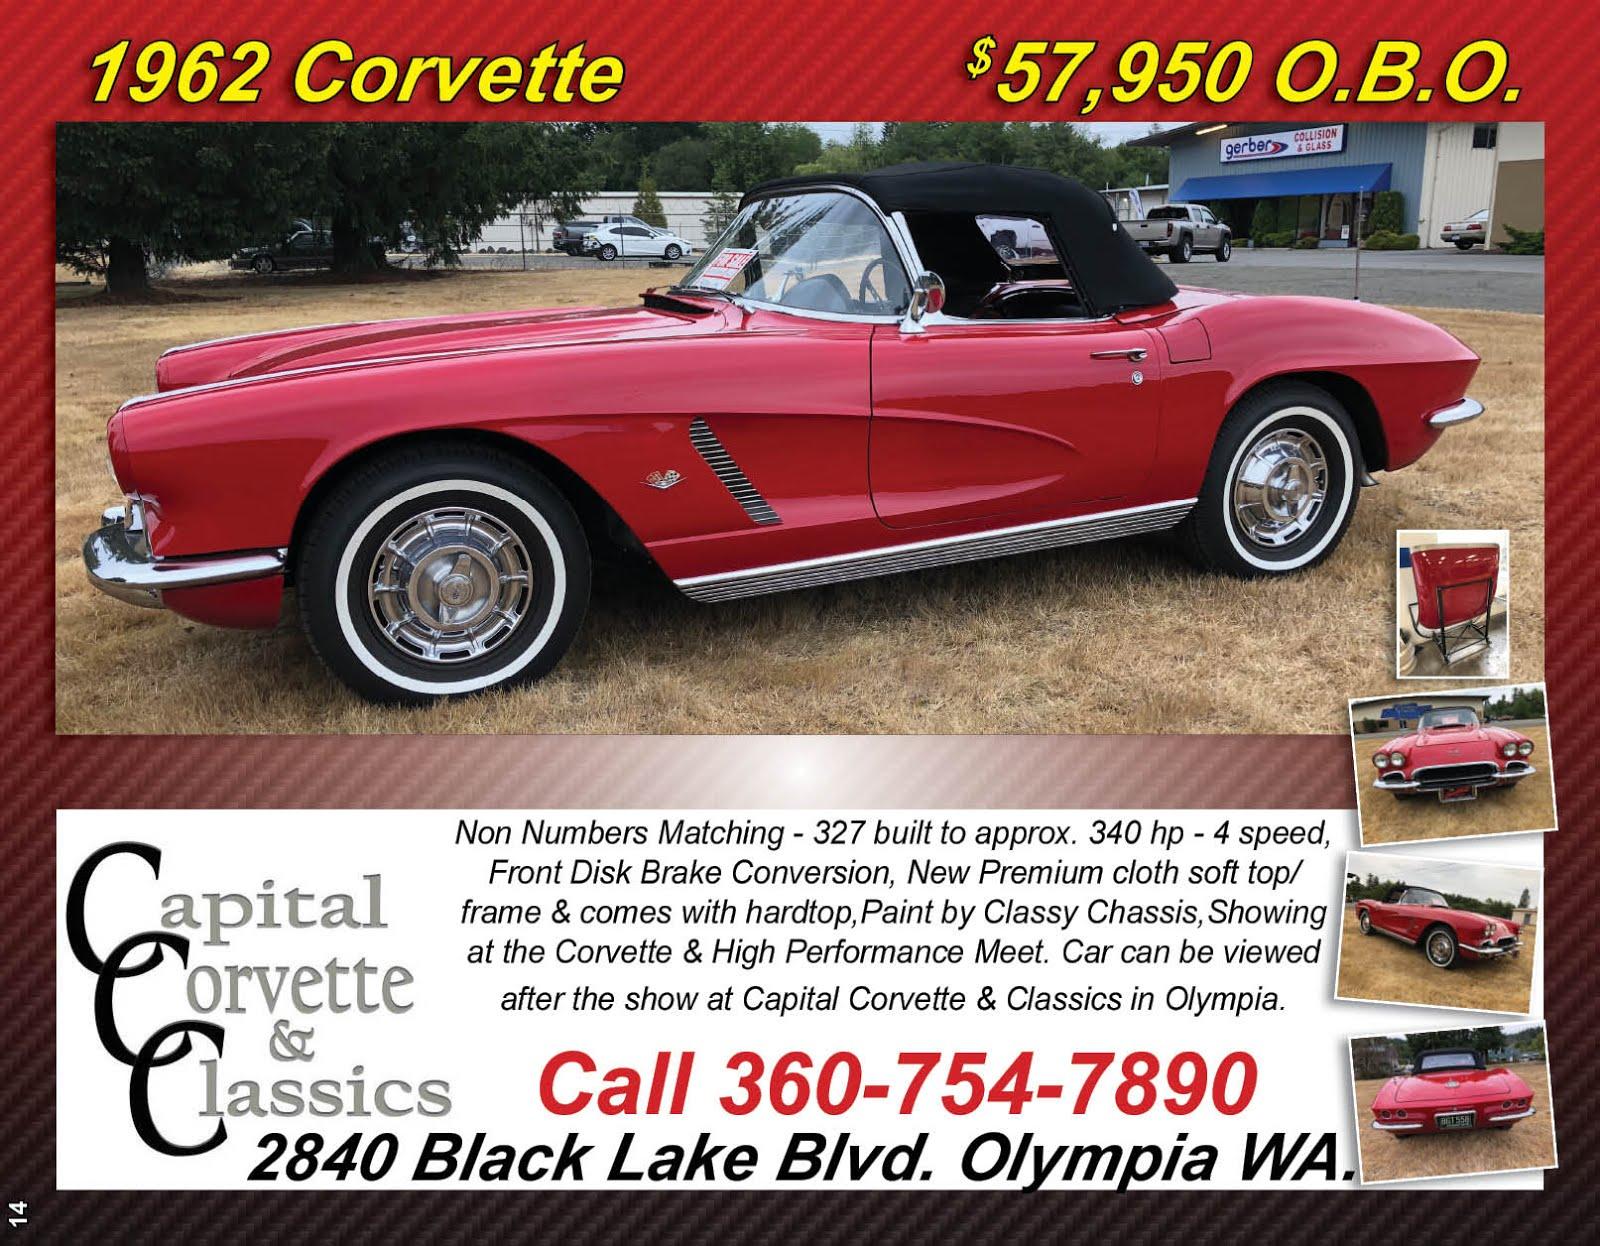 1962 Corvette For Sale @ Capital Corvette & Classics